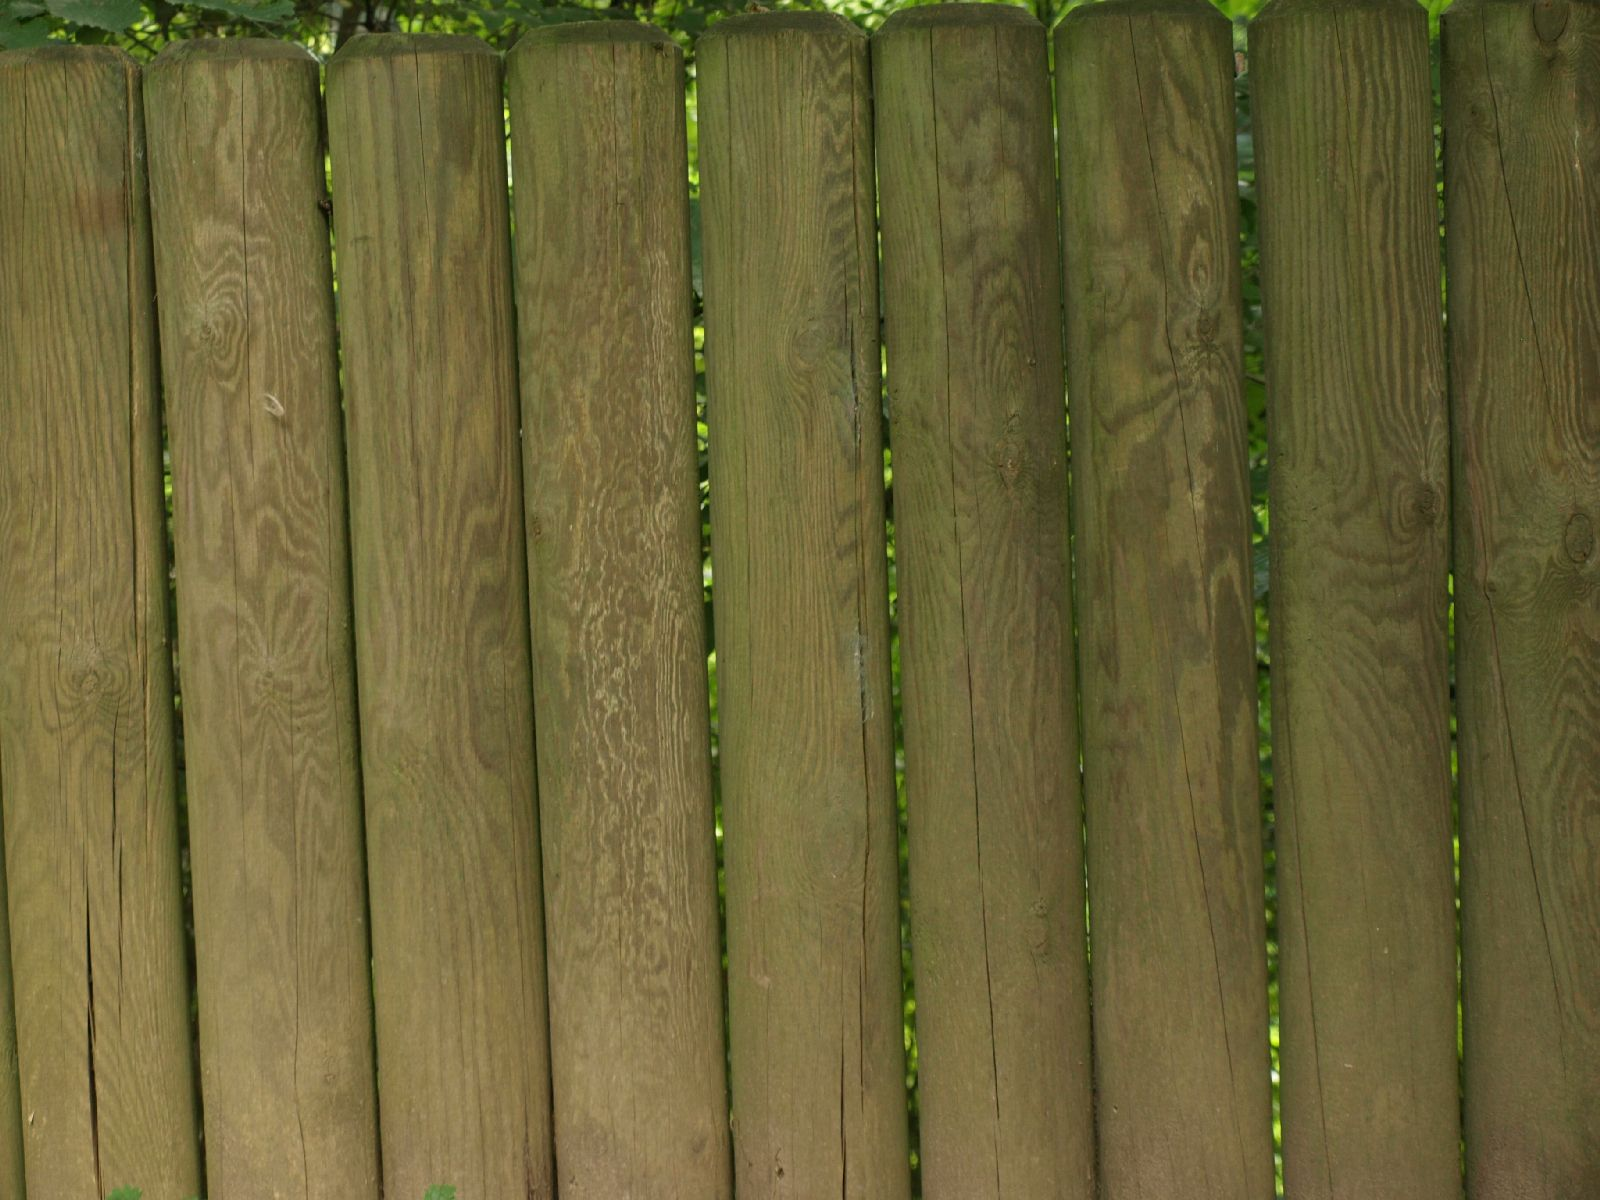 Wood_Texture_A_P9129612